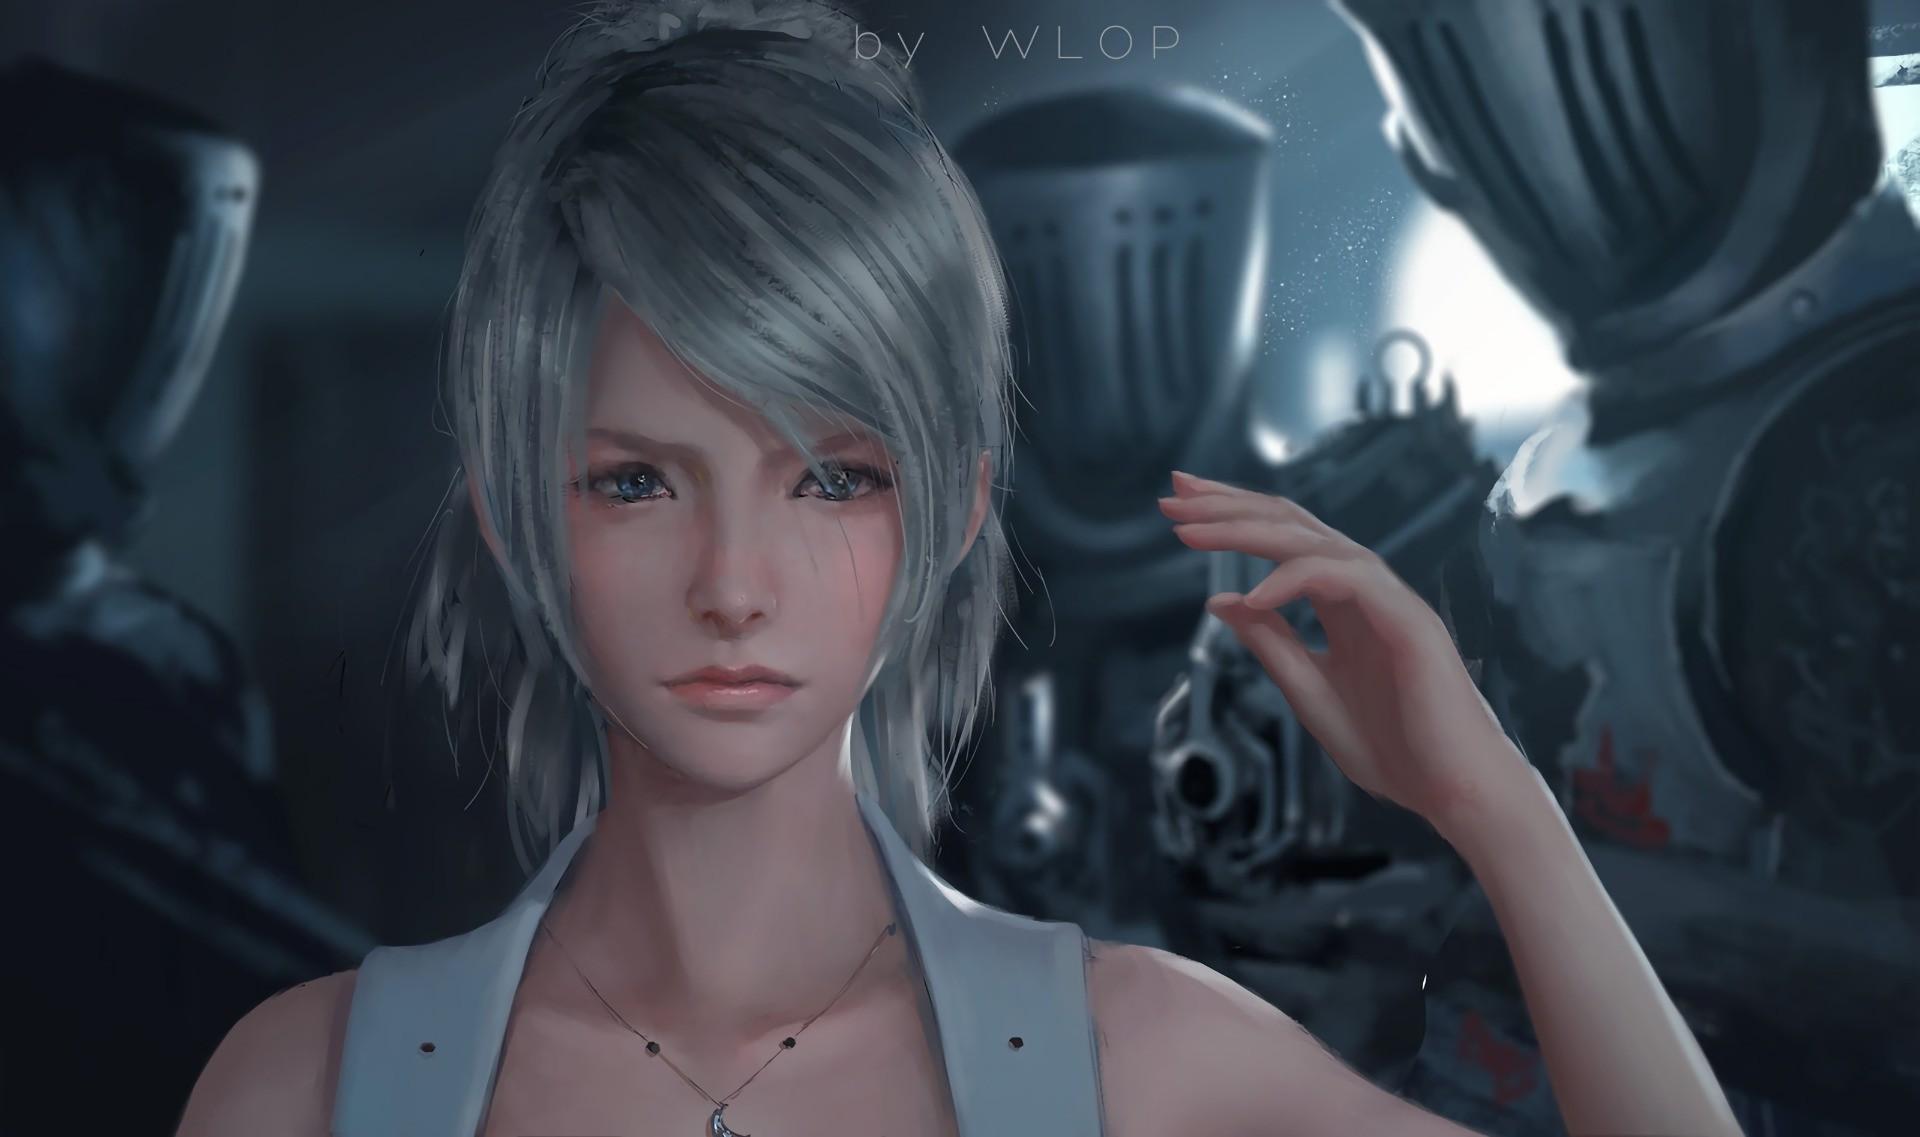 WLOP Final Fantasy XV Luna